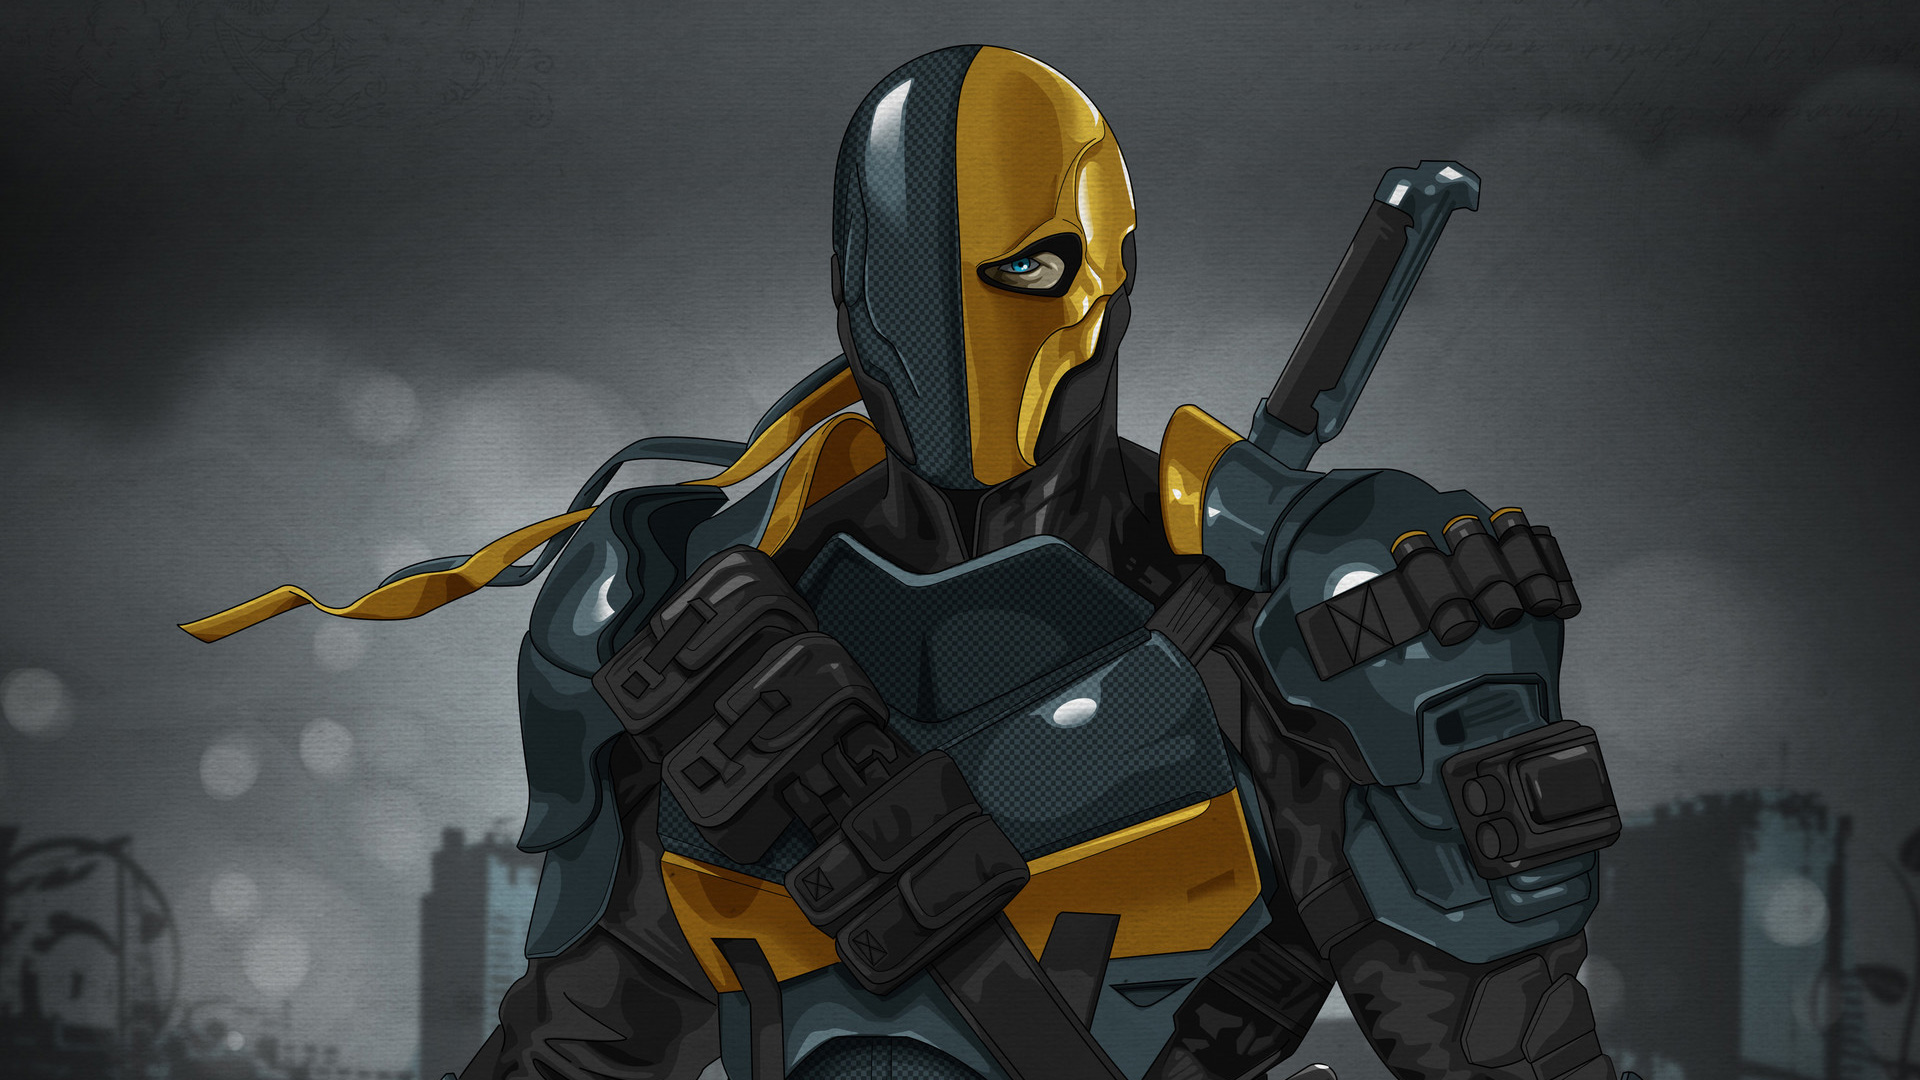 Deathstroke Dc Comics Art, HD Superheroes, 4k Wallpapers ...